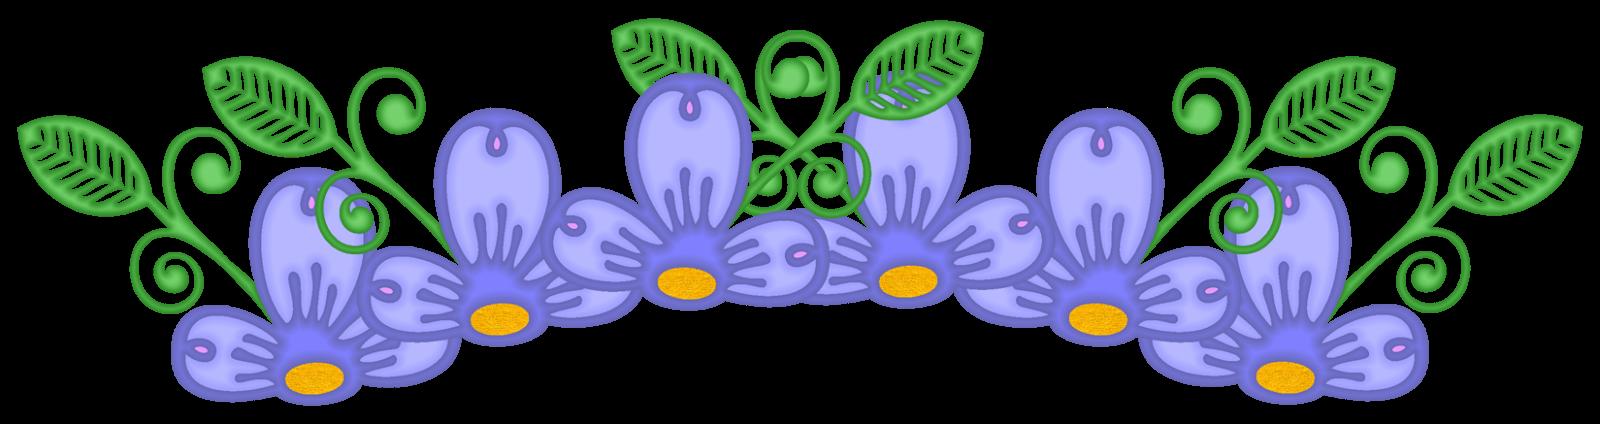 Clipart Blume 3